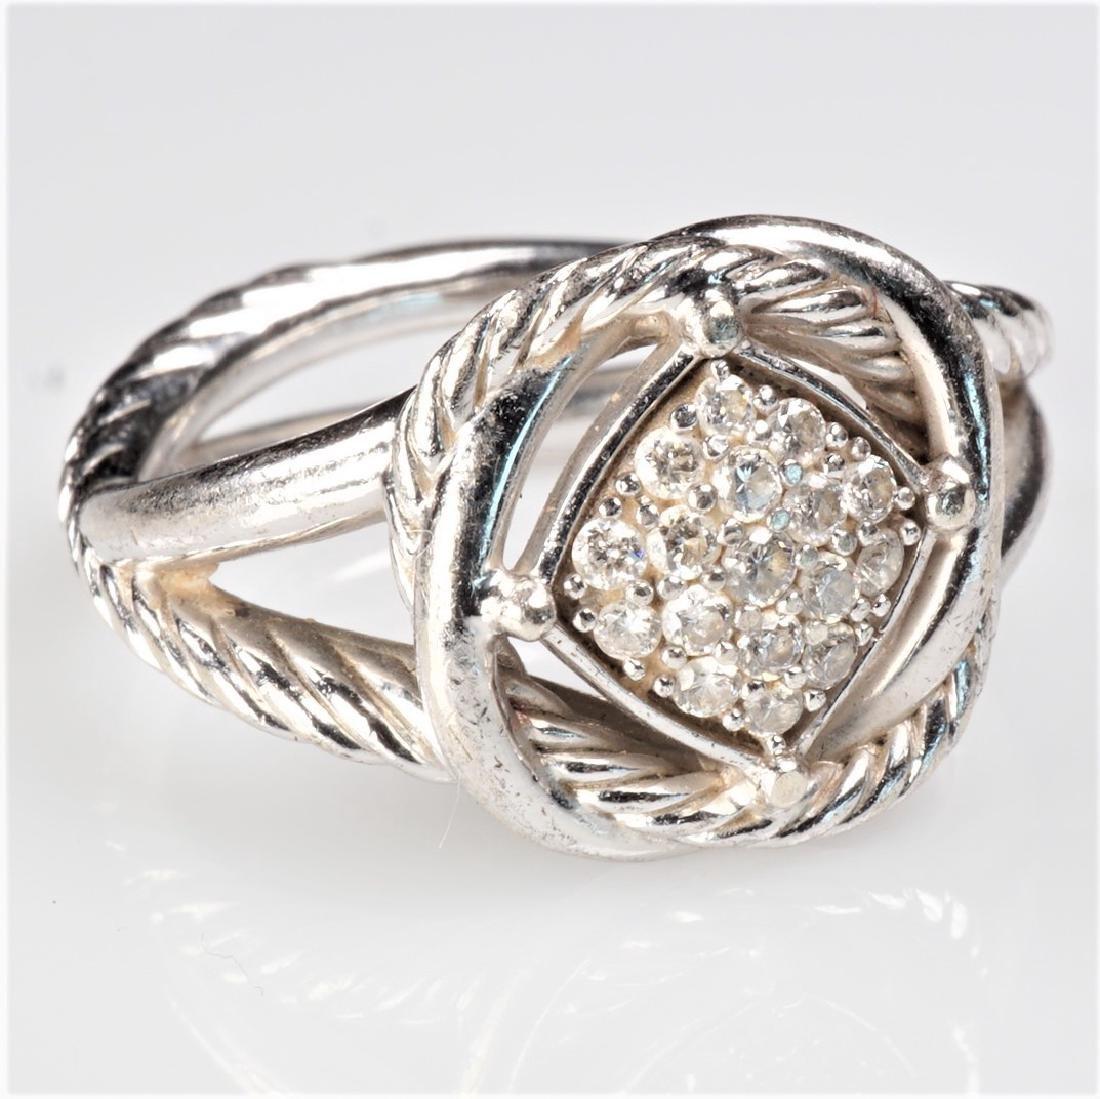 David Yurman Sterling and Diamond Ring Sz 5.75